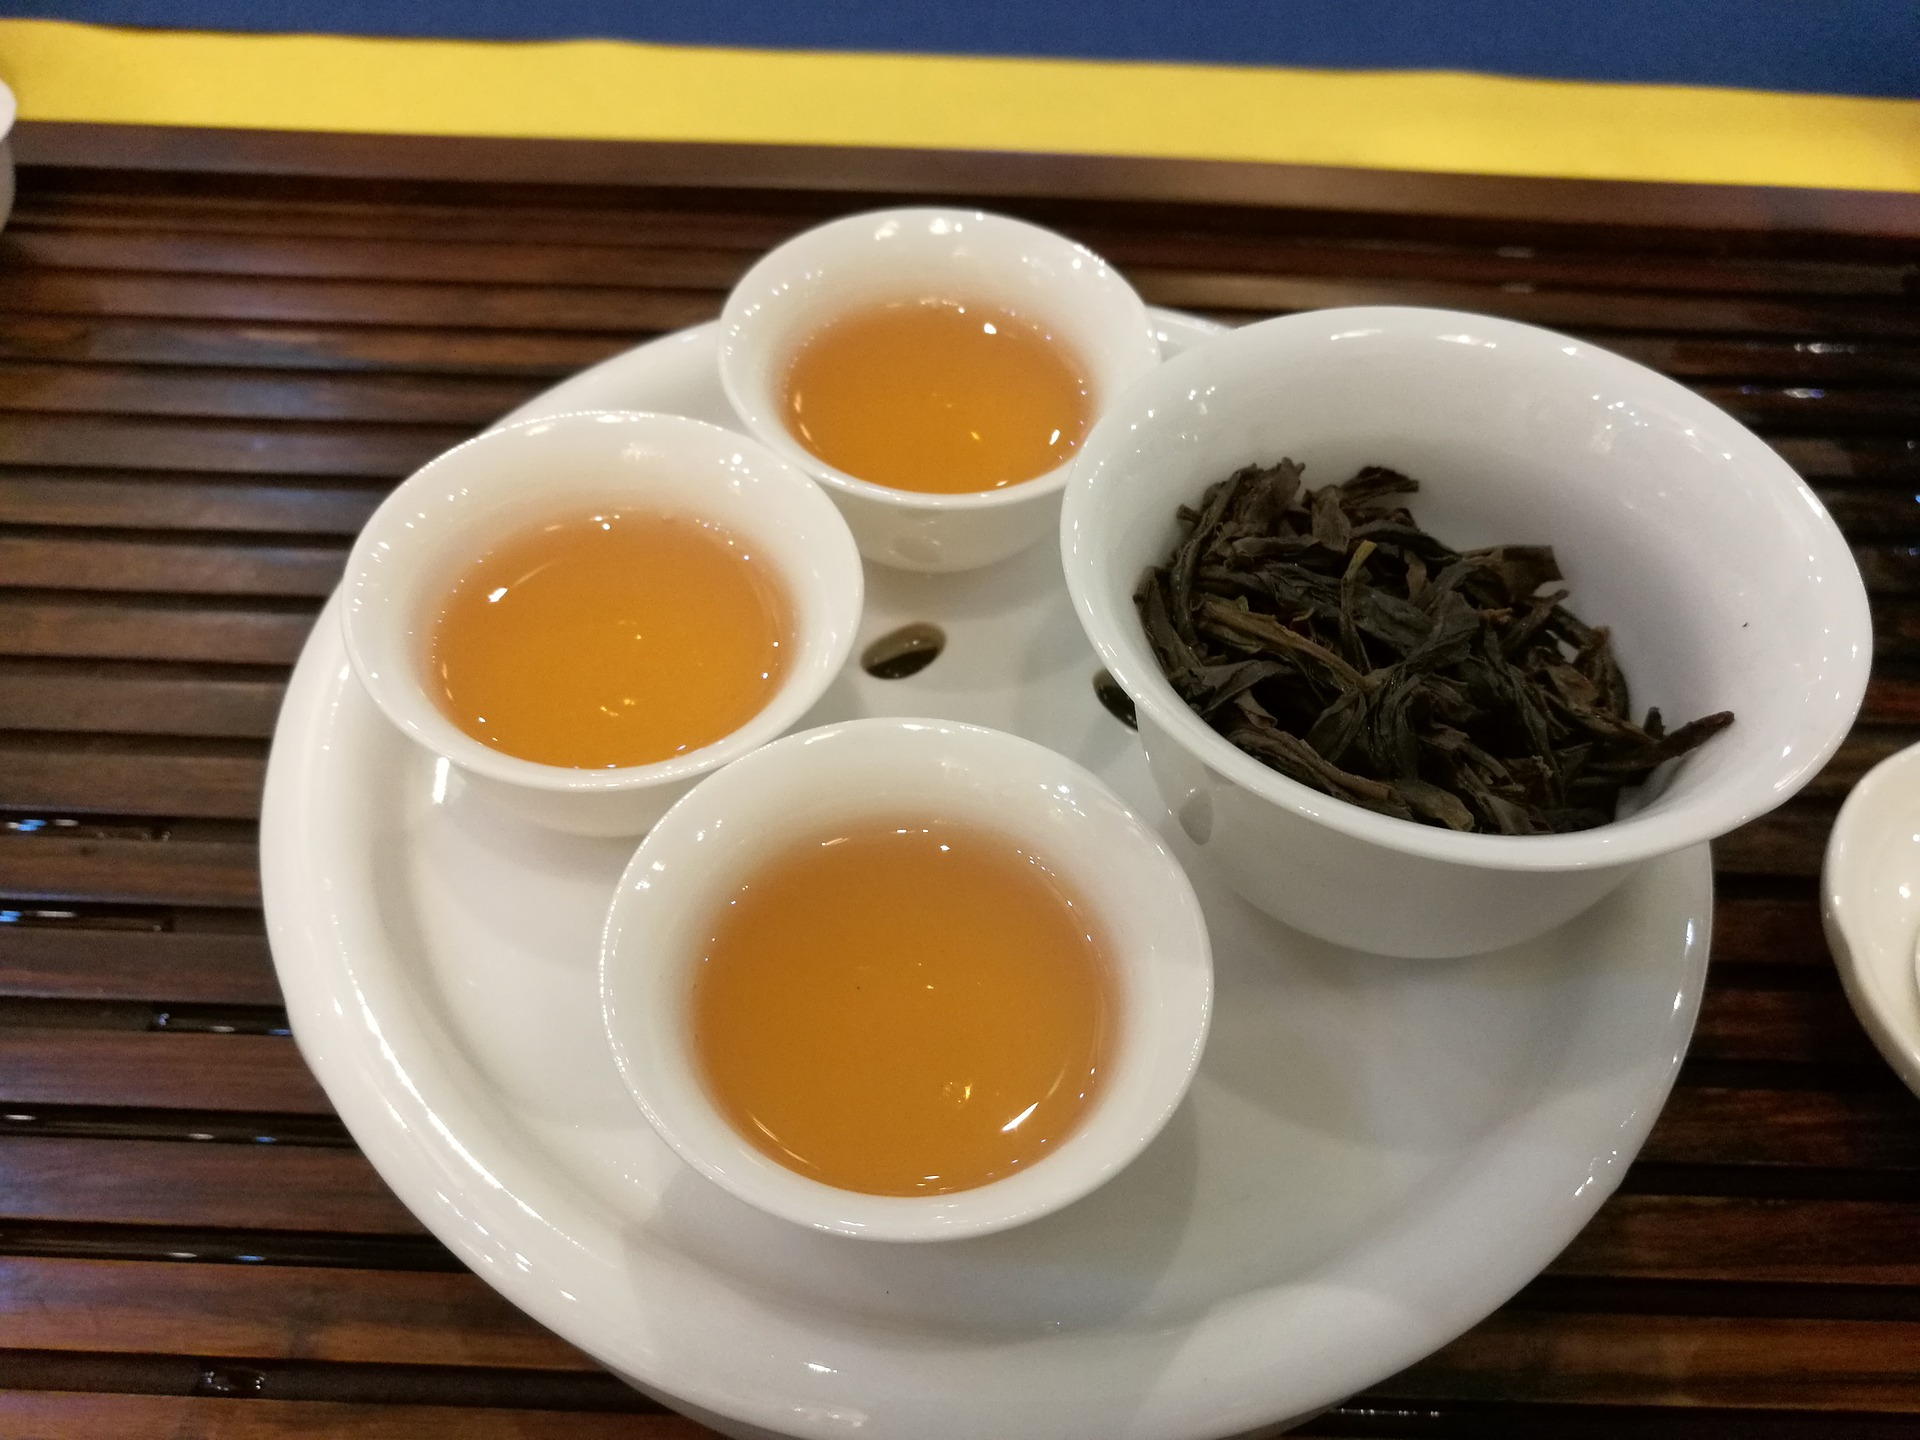 najlepsza herbata